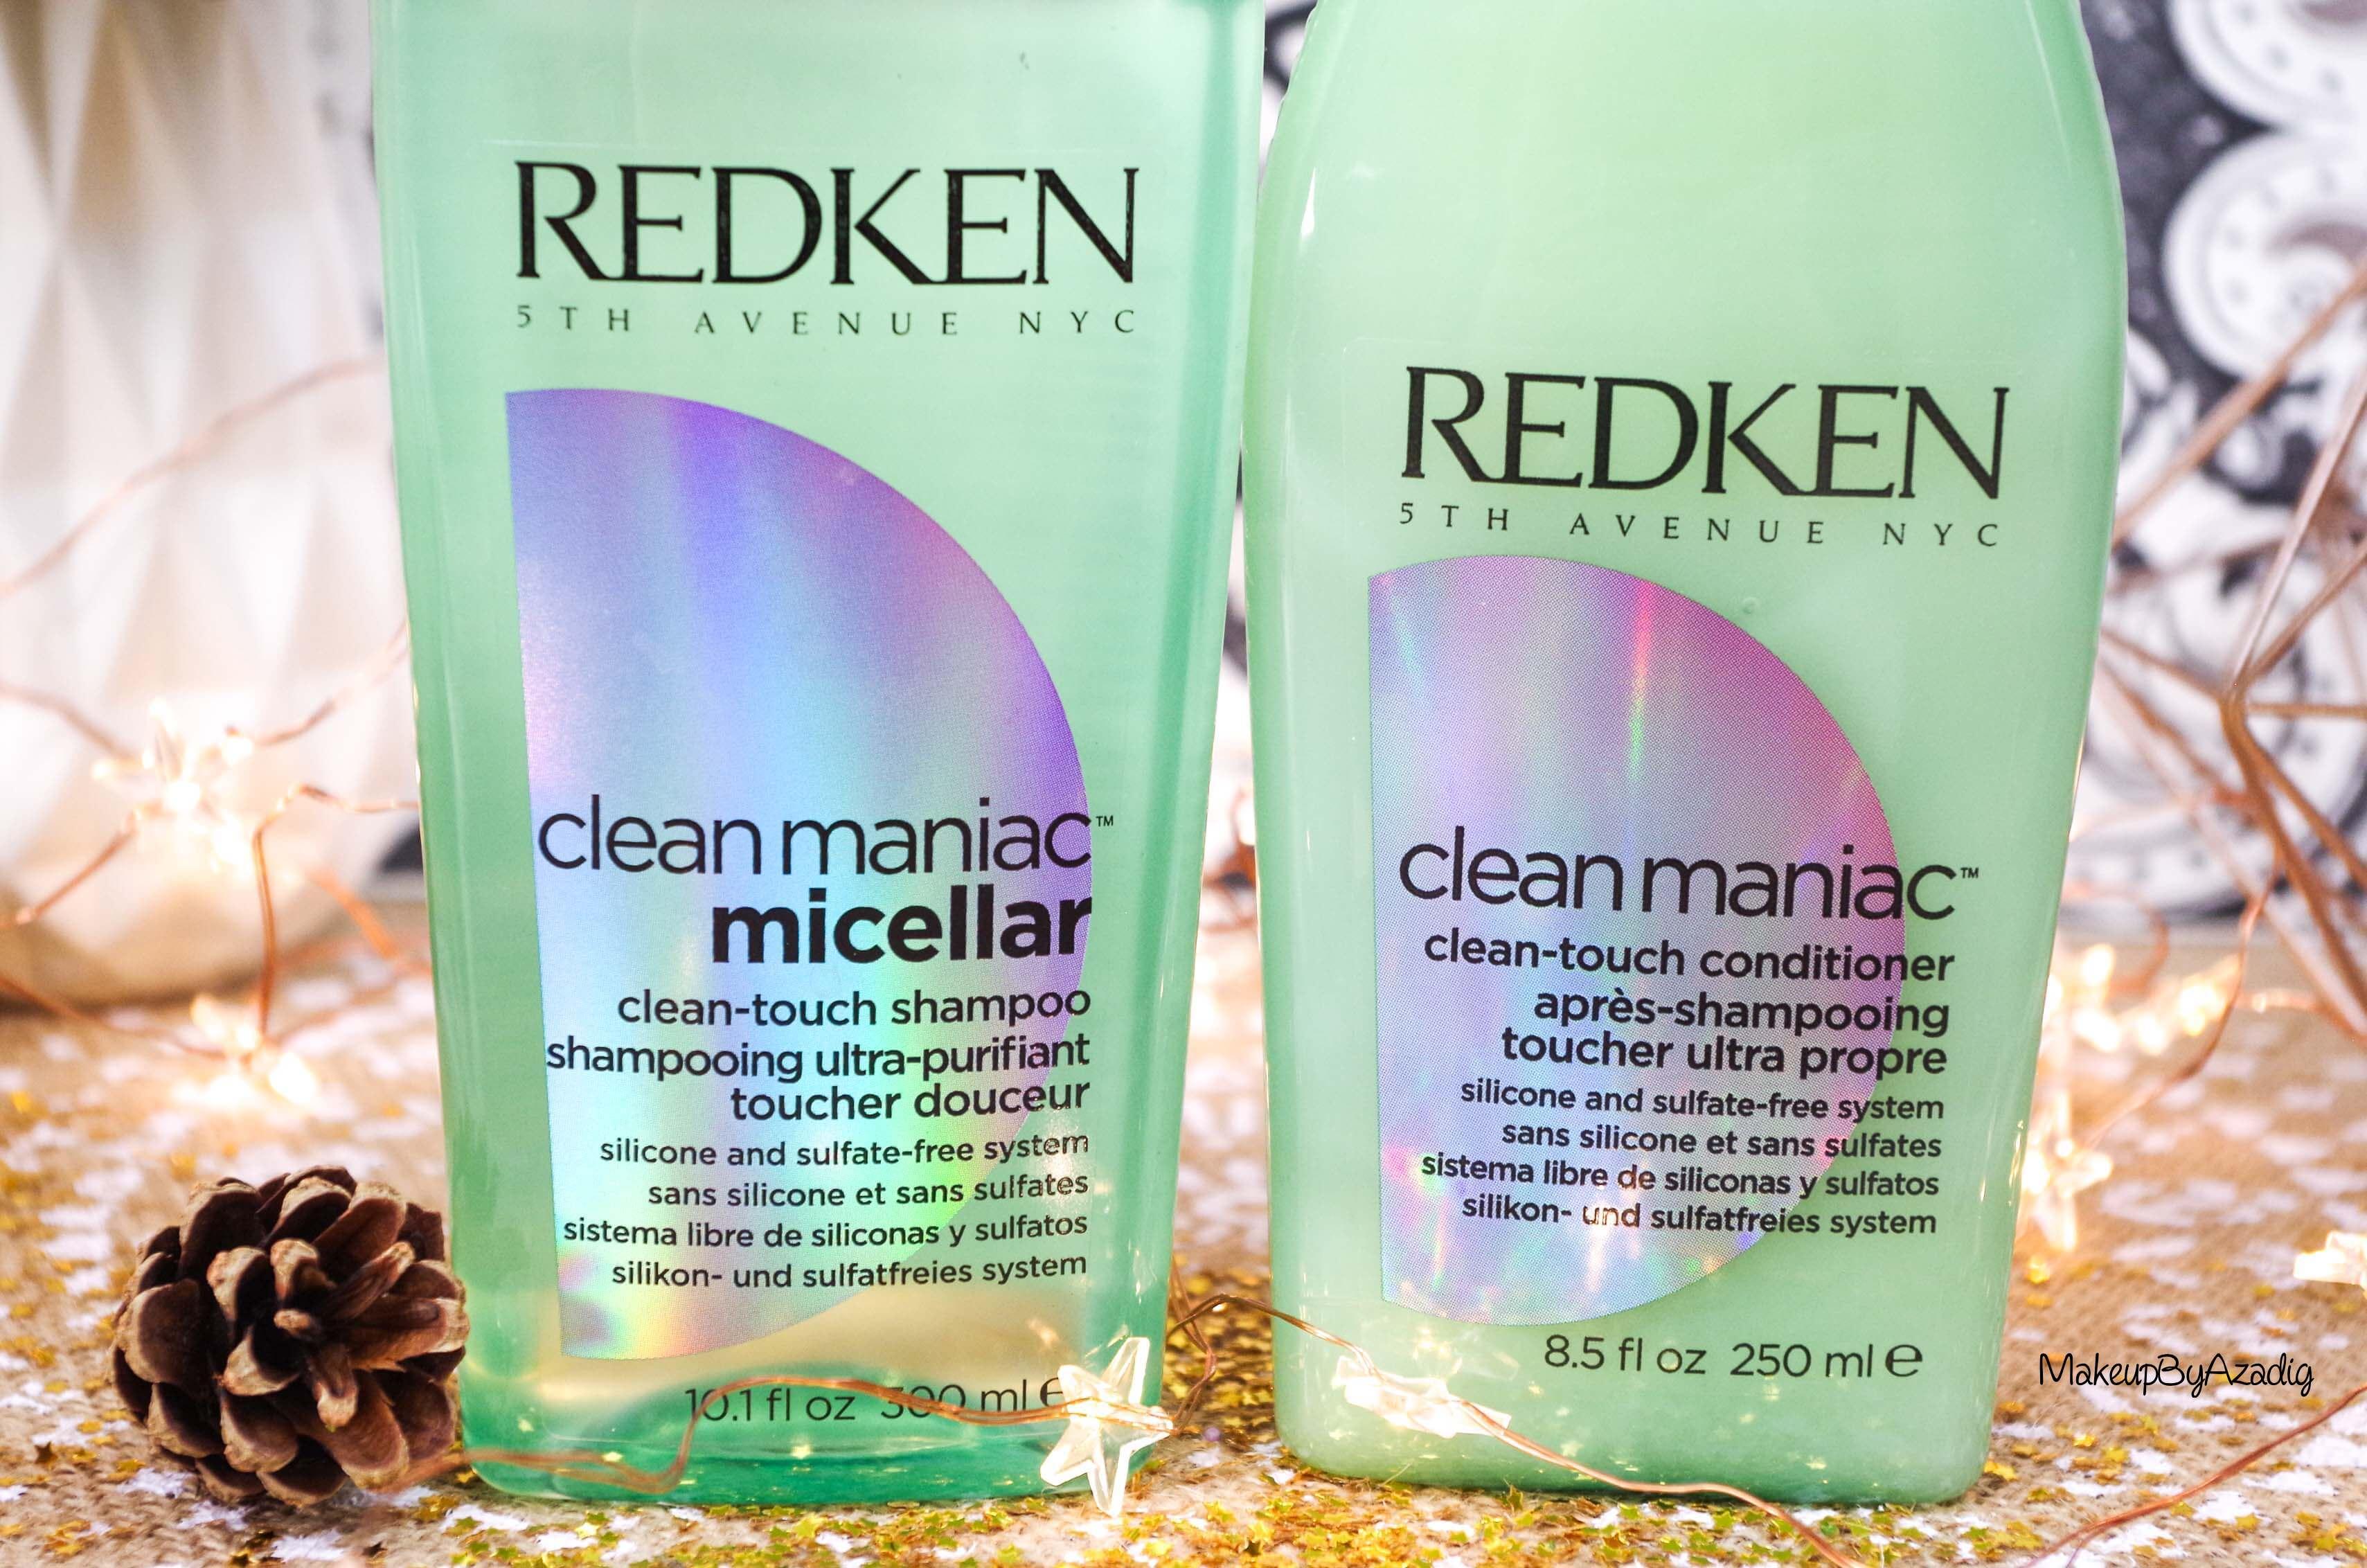 revue-shampooing-conditioner-clean-maniac-redken-programme-detox-anti-pollution-makeupbyazadig-cleanhair-sans-silicone-sulfate-avis